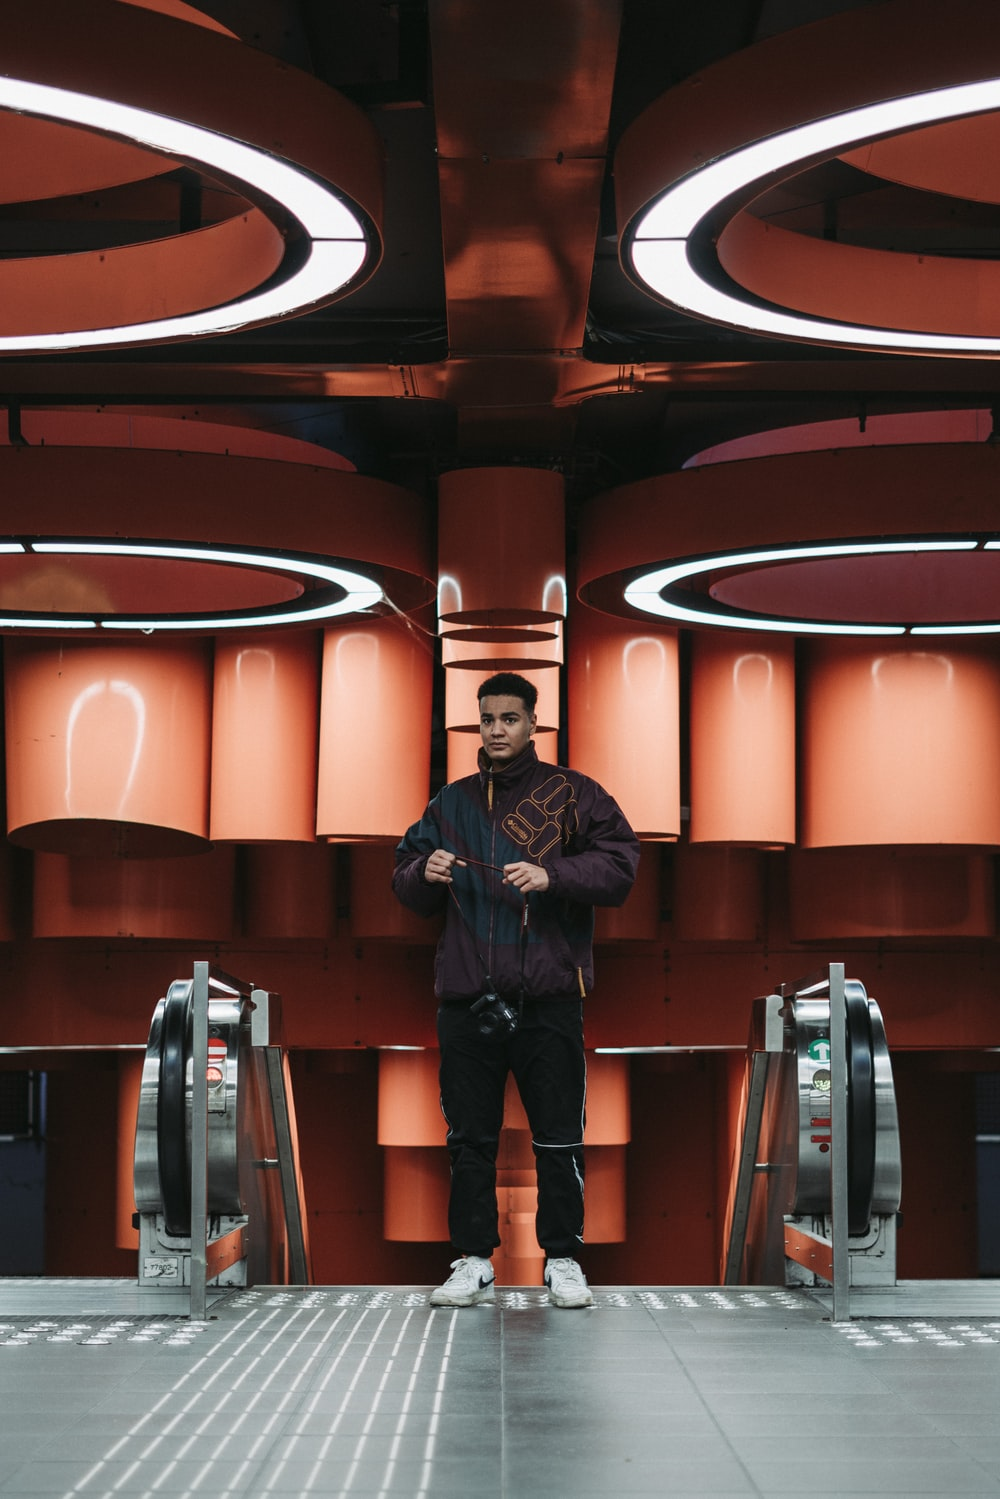 man in black jacket standing on escalator